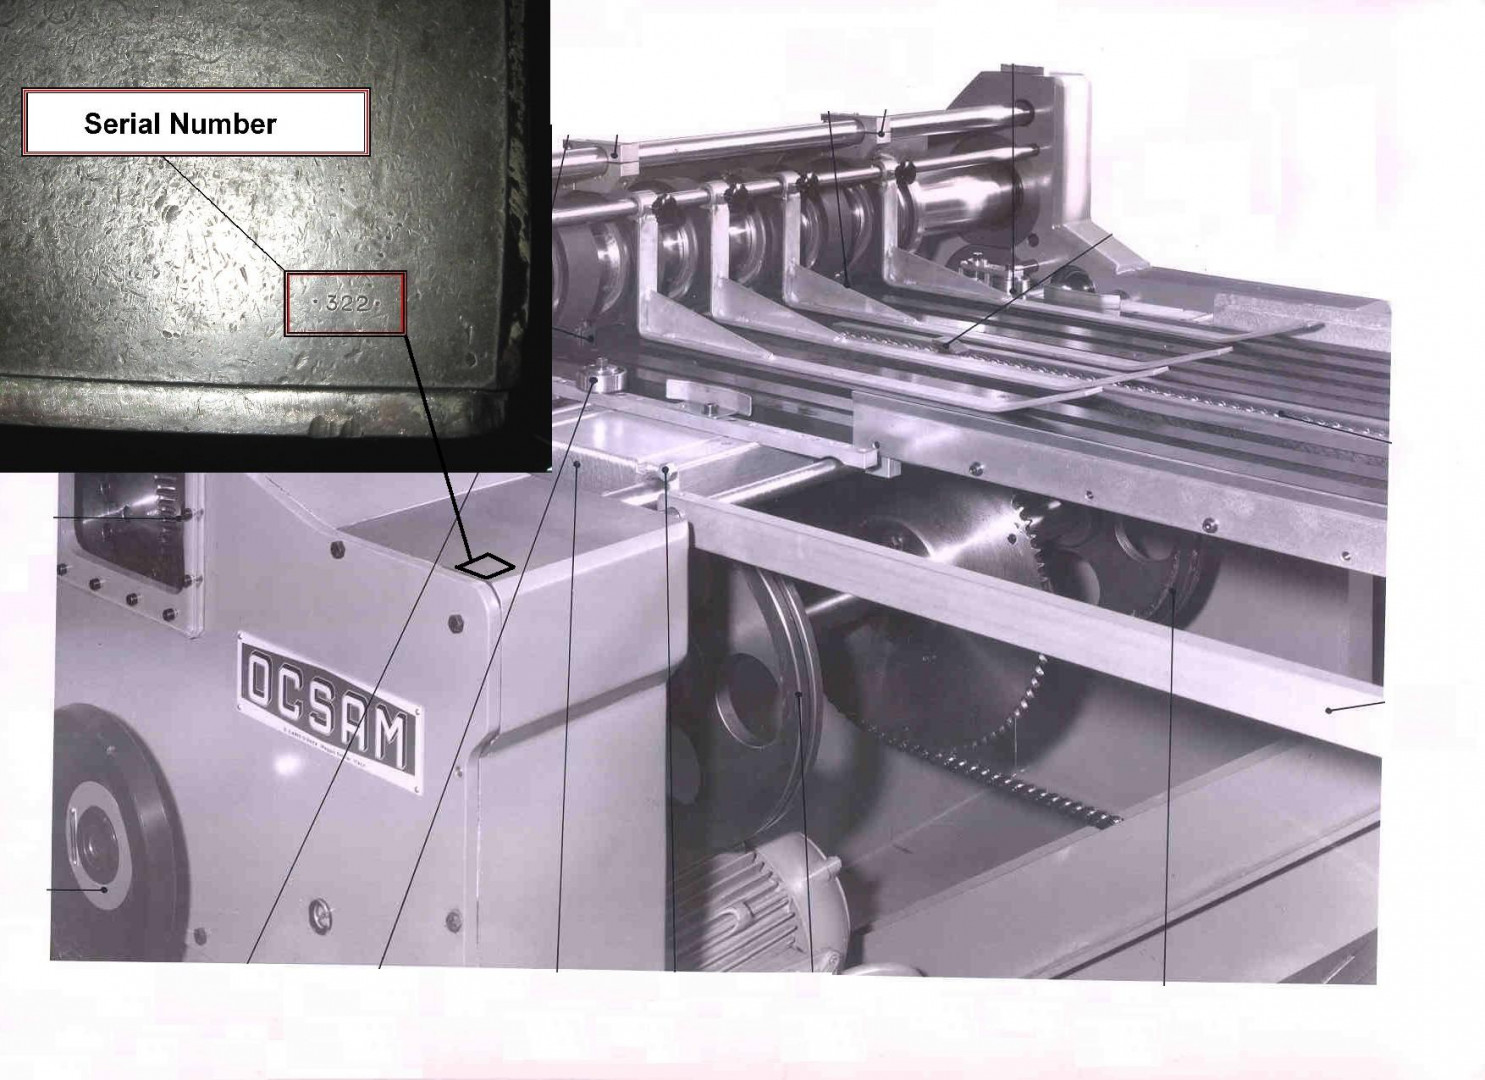 Ocsam CA1/CA3 duplex slitter